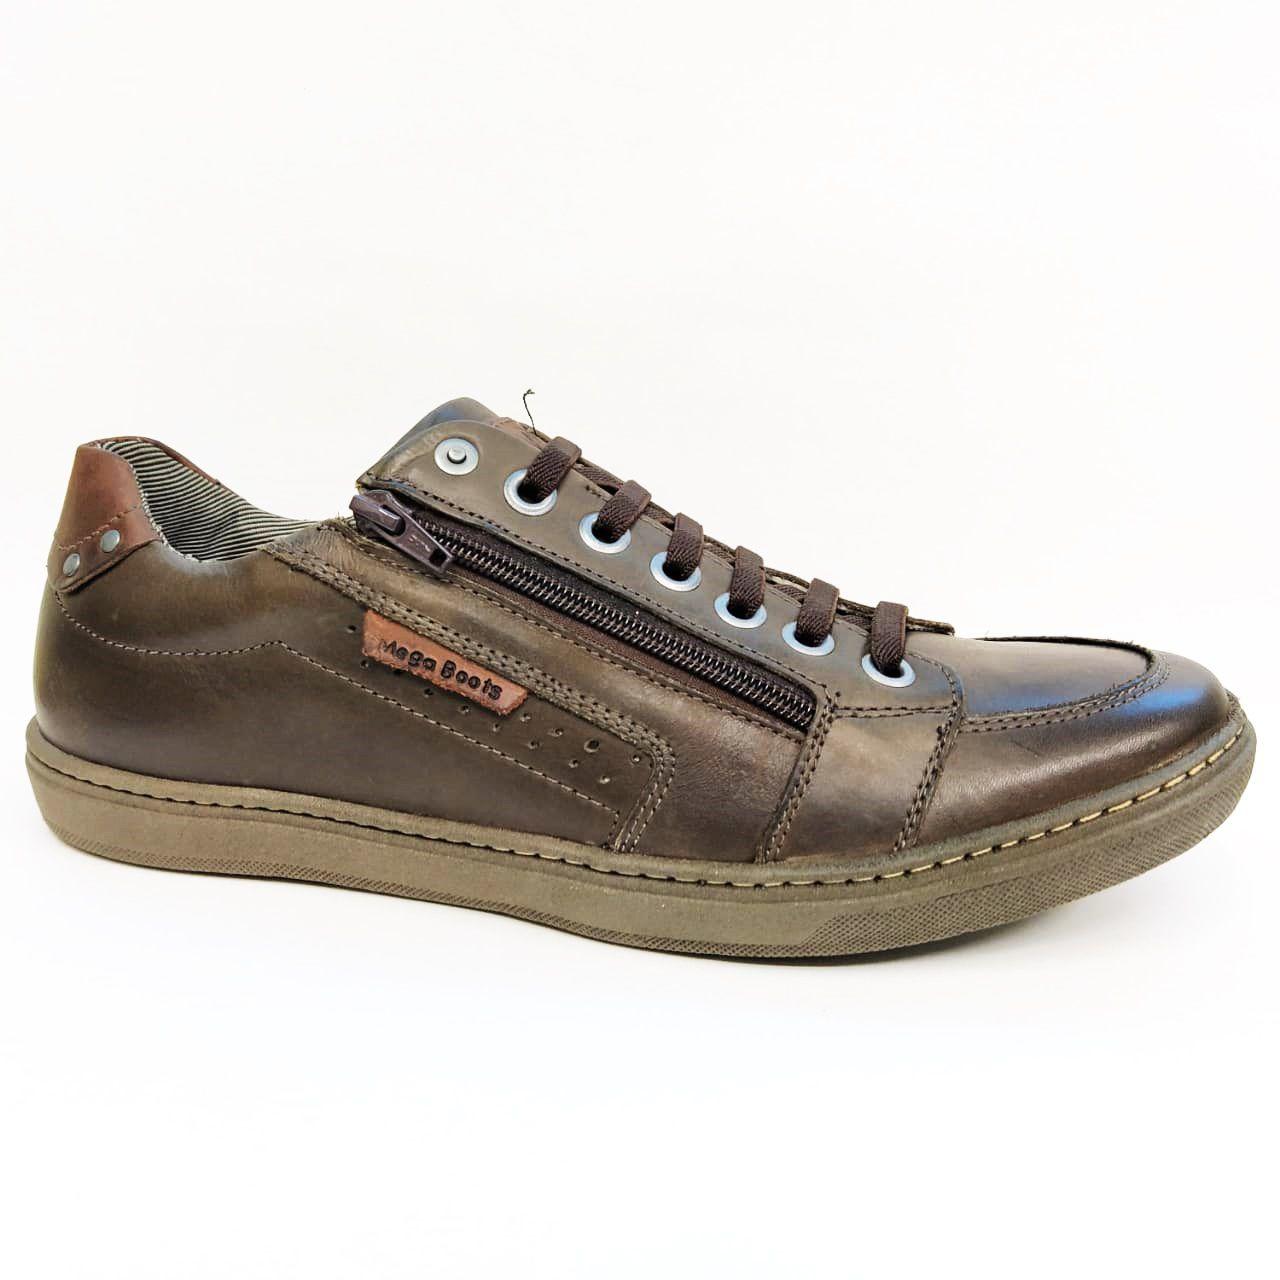 Sapatênis Masculino Mega Boots 15011 - Café